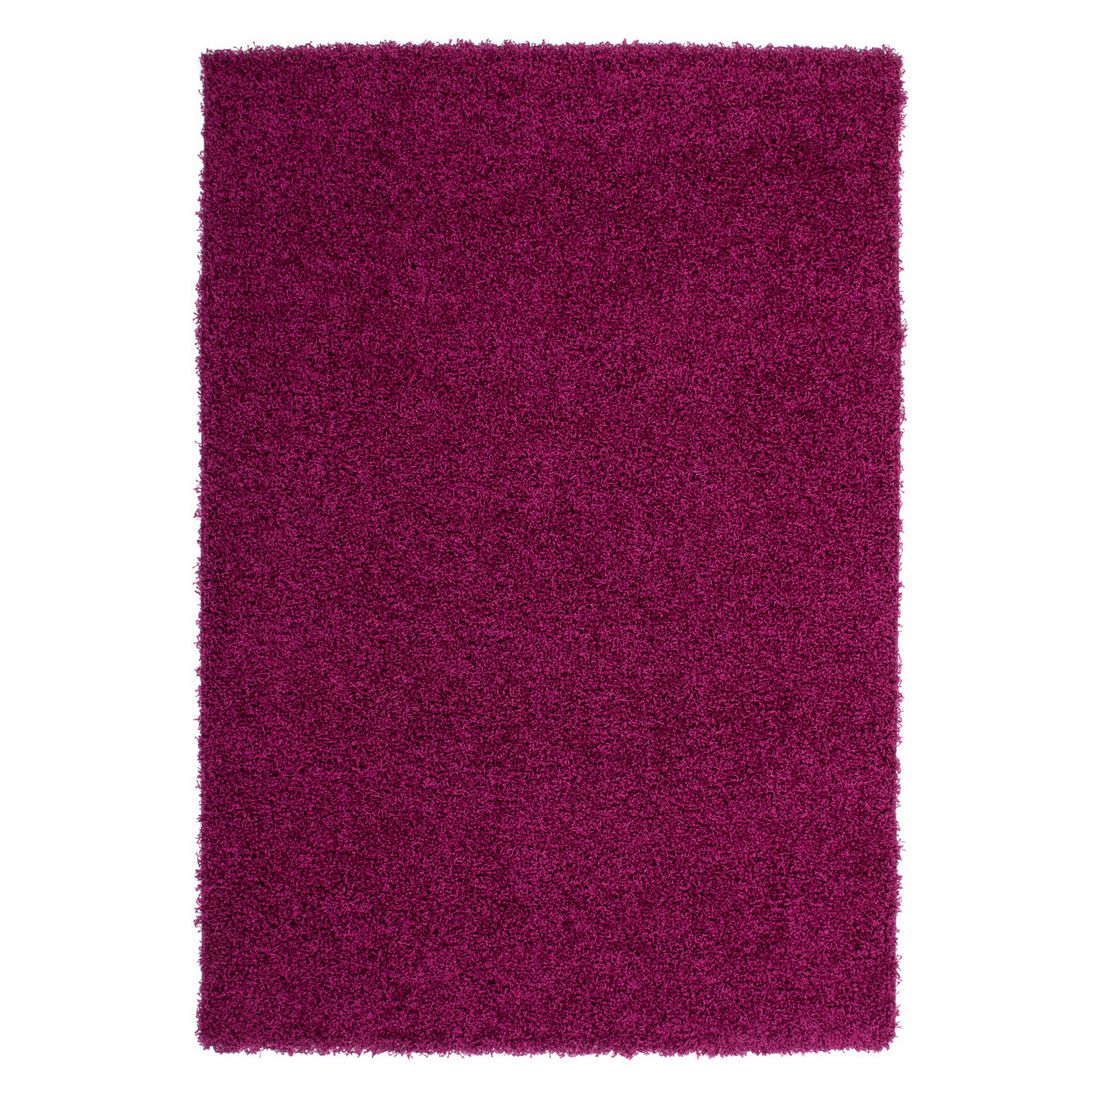 Teppich Salsa - Violett - 200 x 290 cm, Obsession